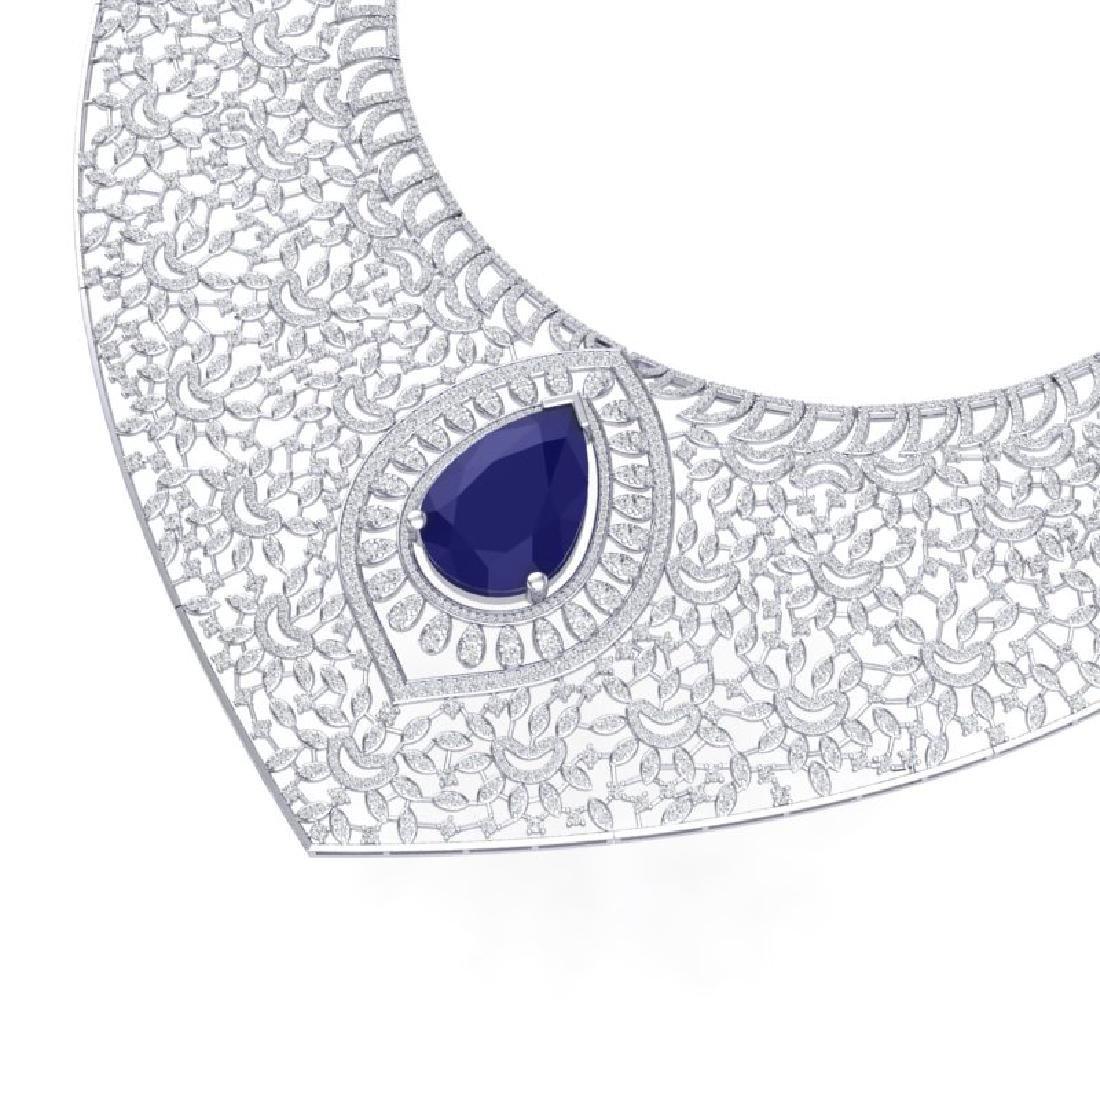 63.93 CTW Royalty Sapphire & VS Diamond Necklace 18K